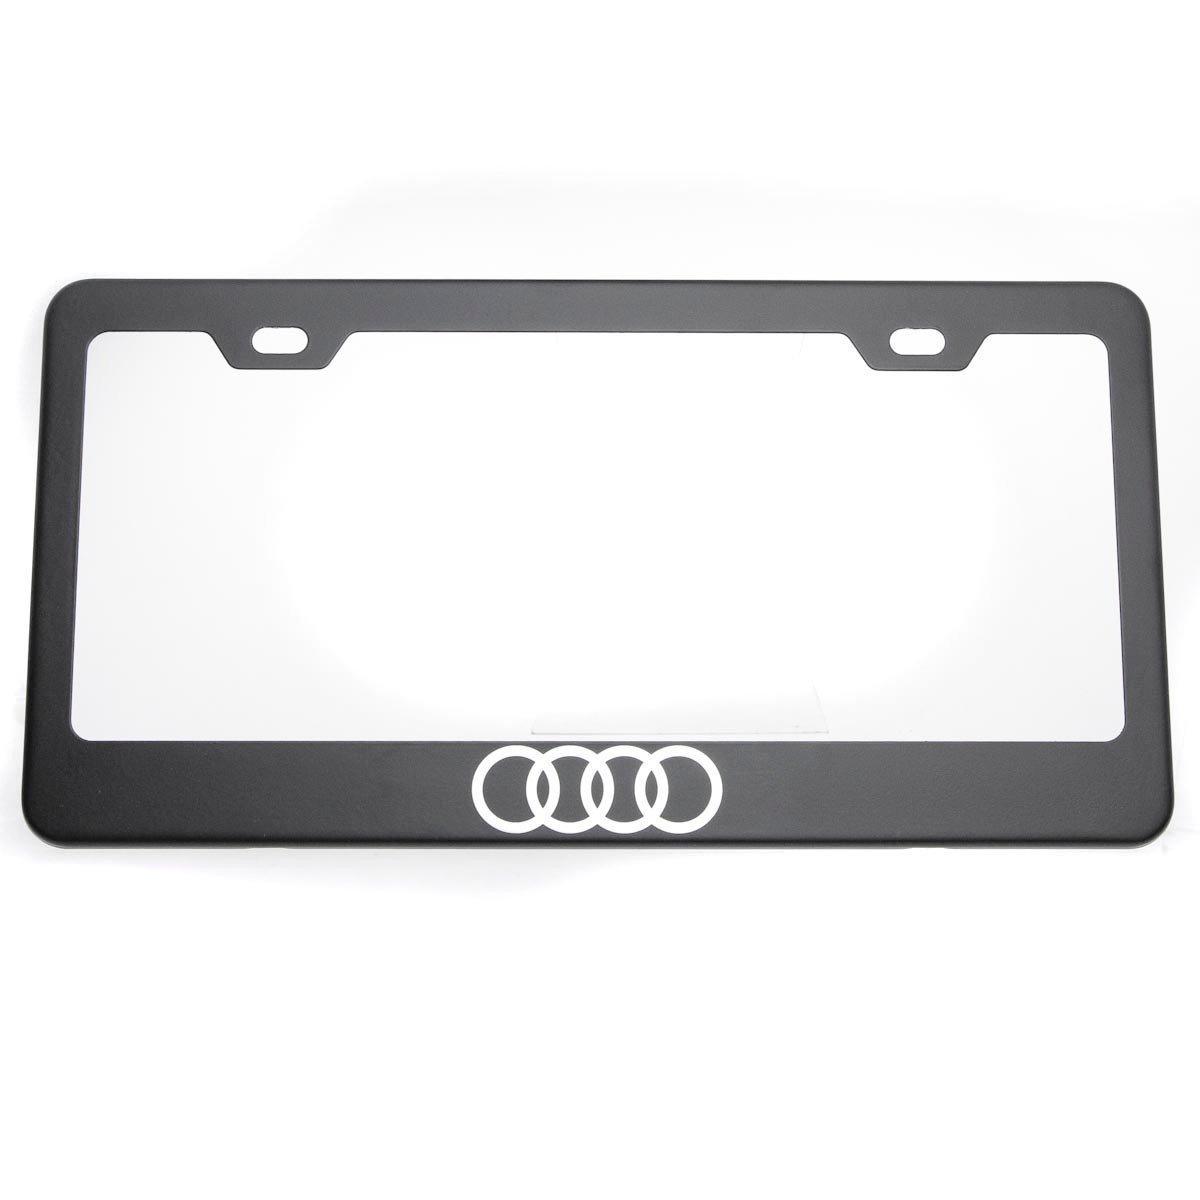 Buy One Matte Black Audi Logo Mirror Stainless Steel License Plate ...